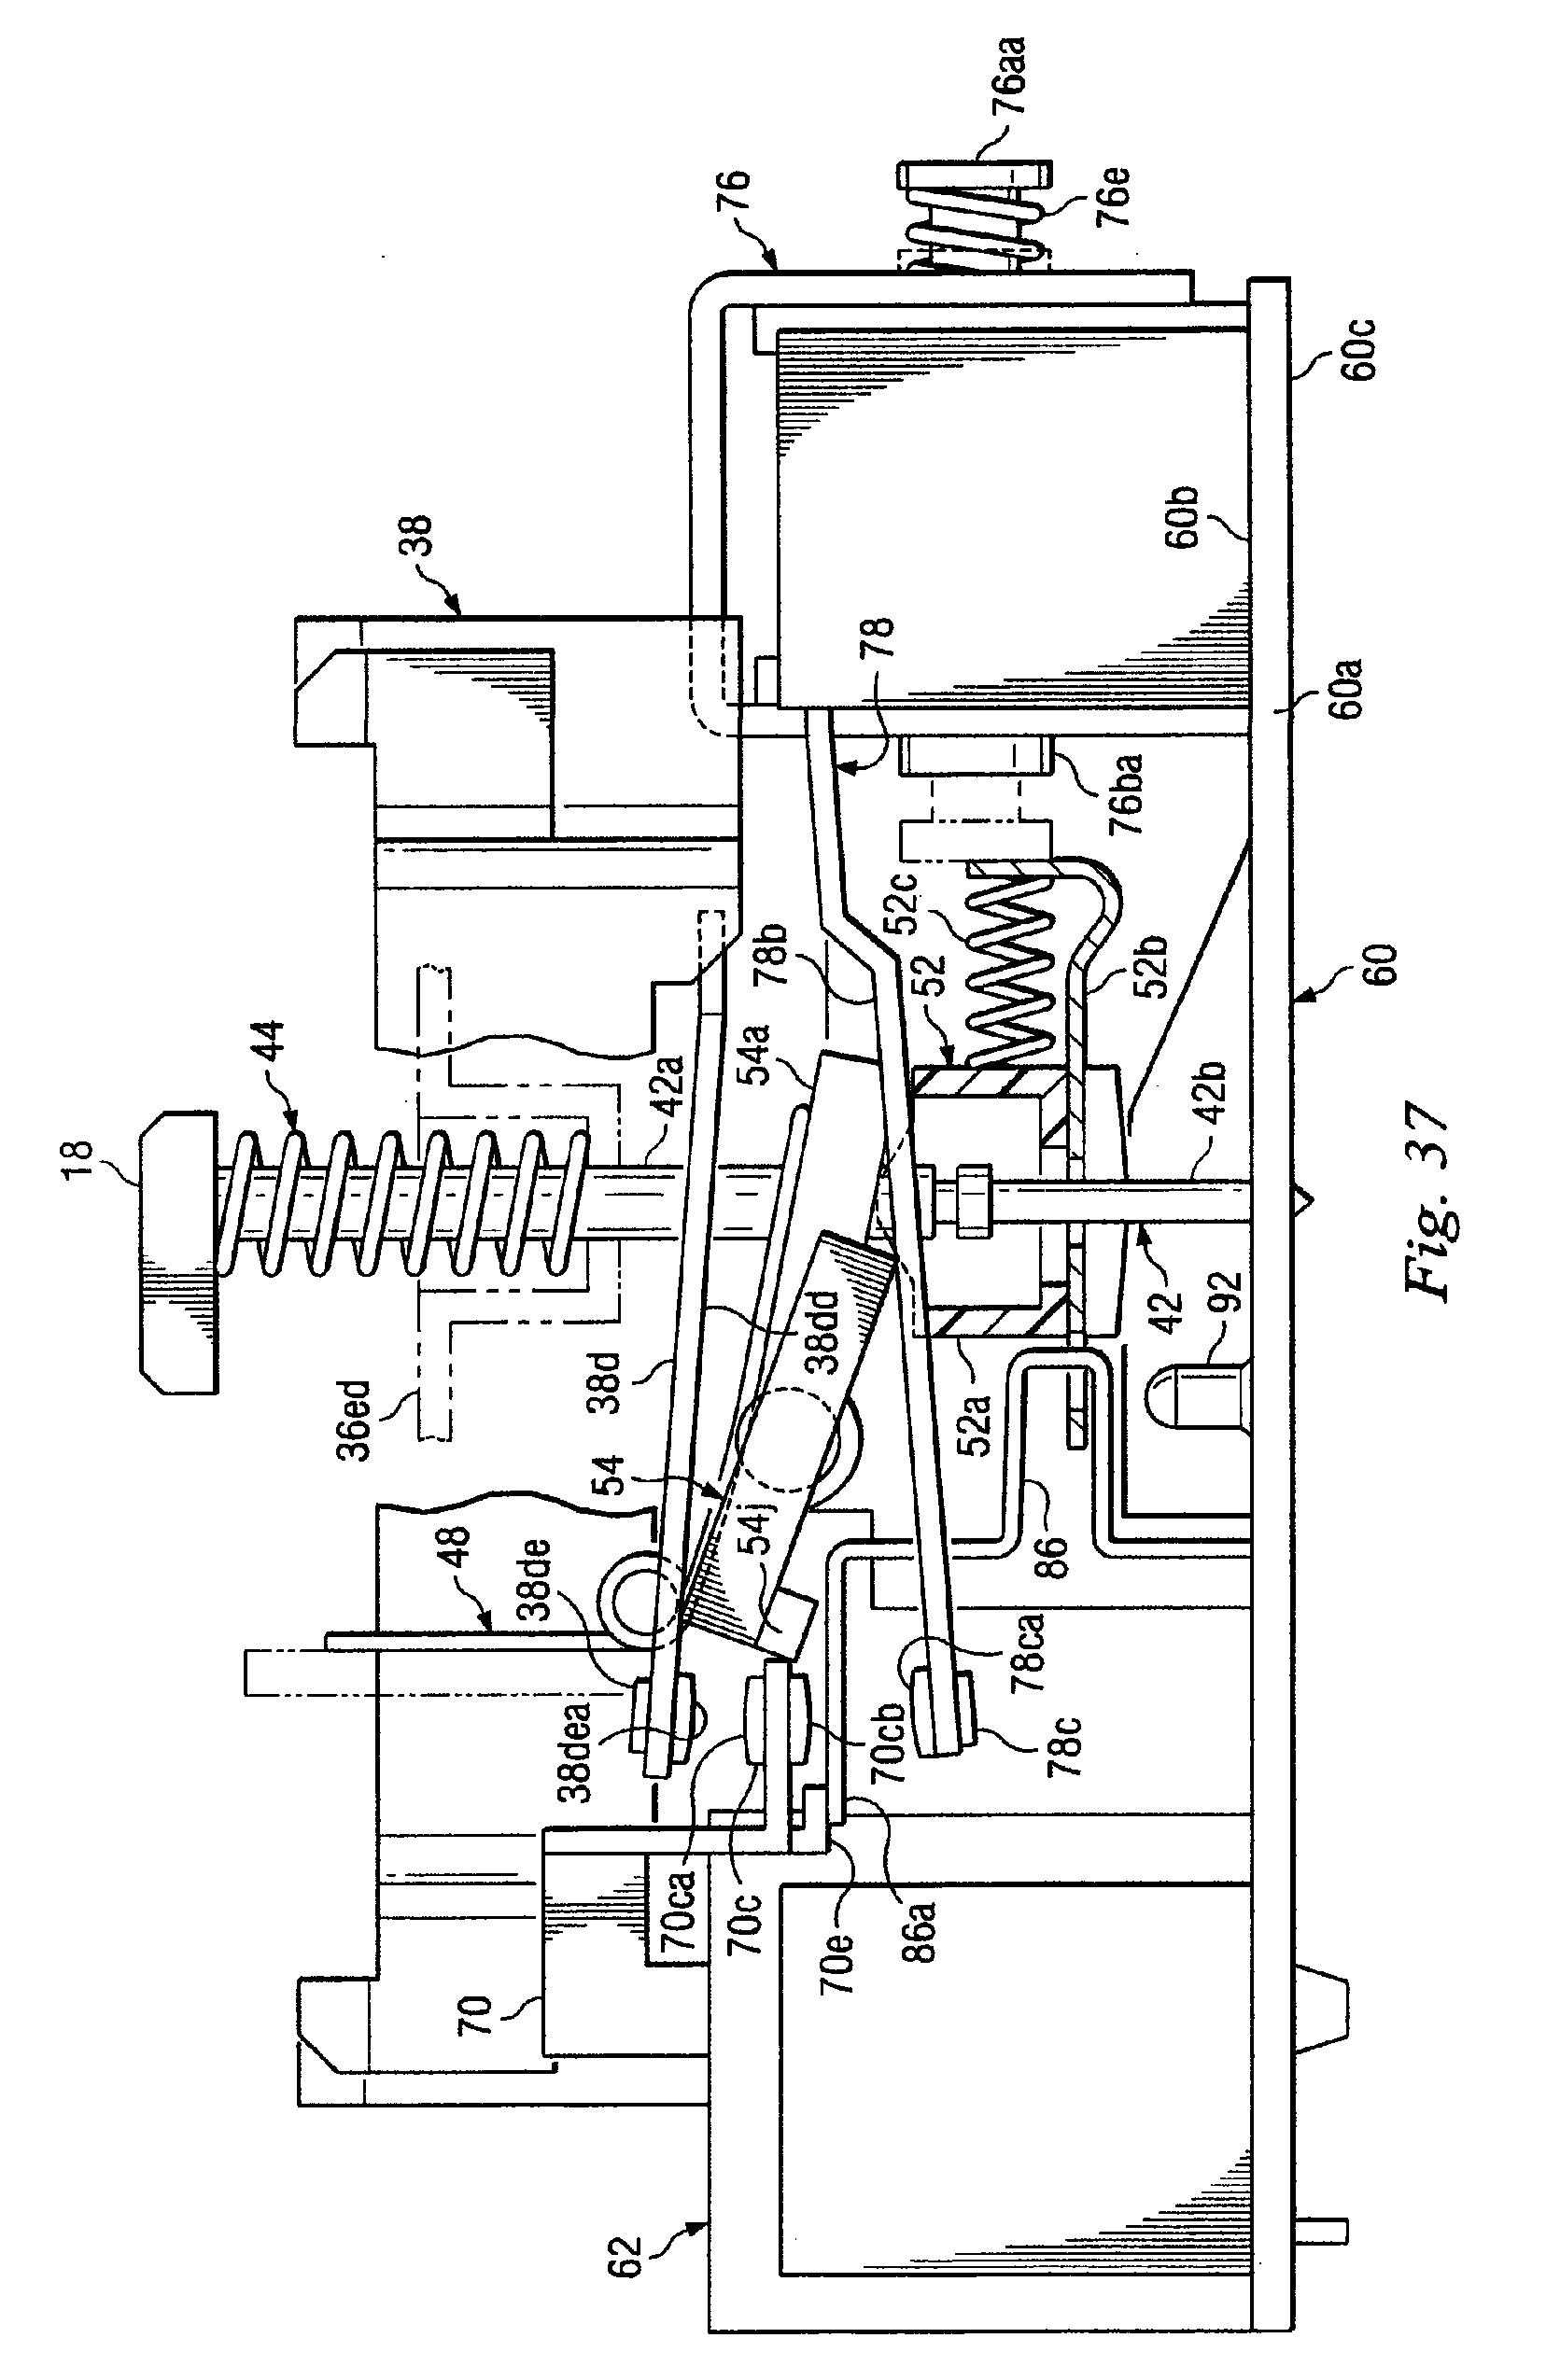 patent us7864005 - arc-fault circuit interrupter device